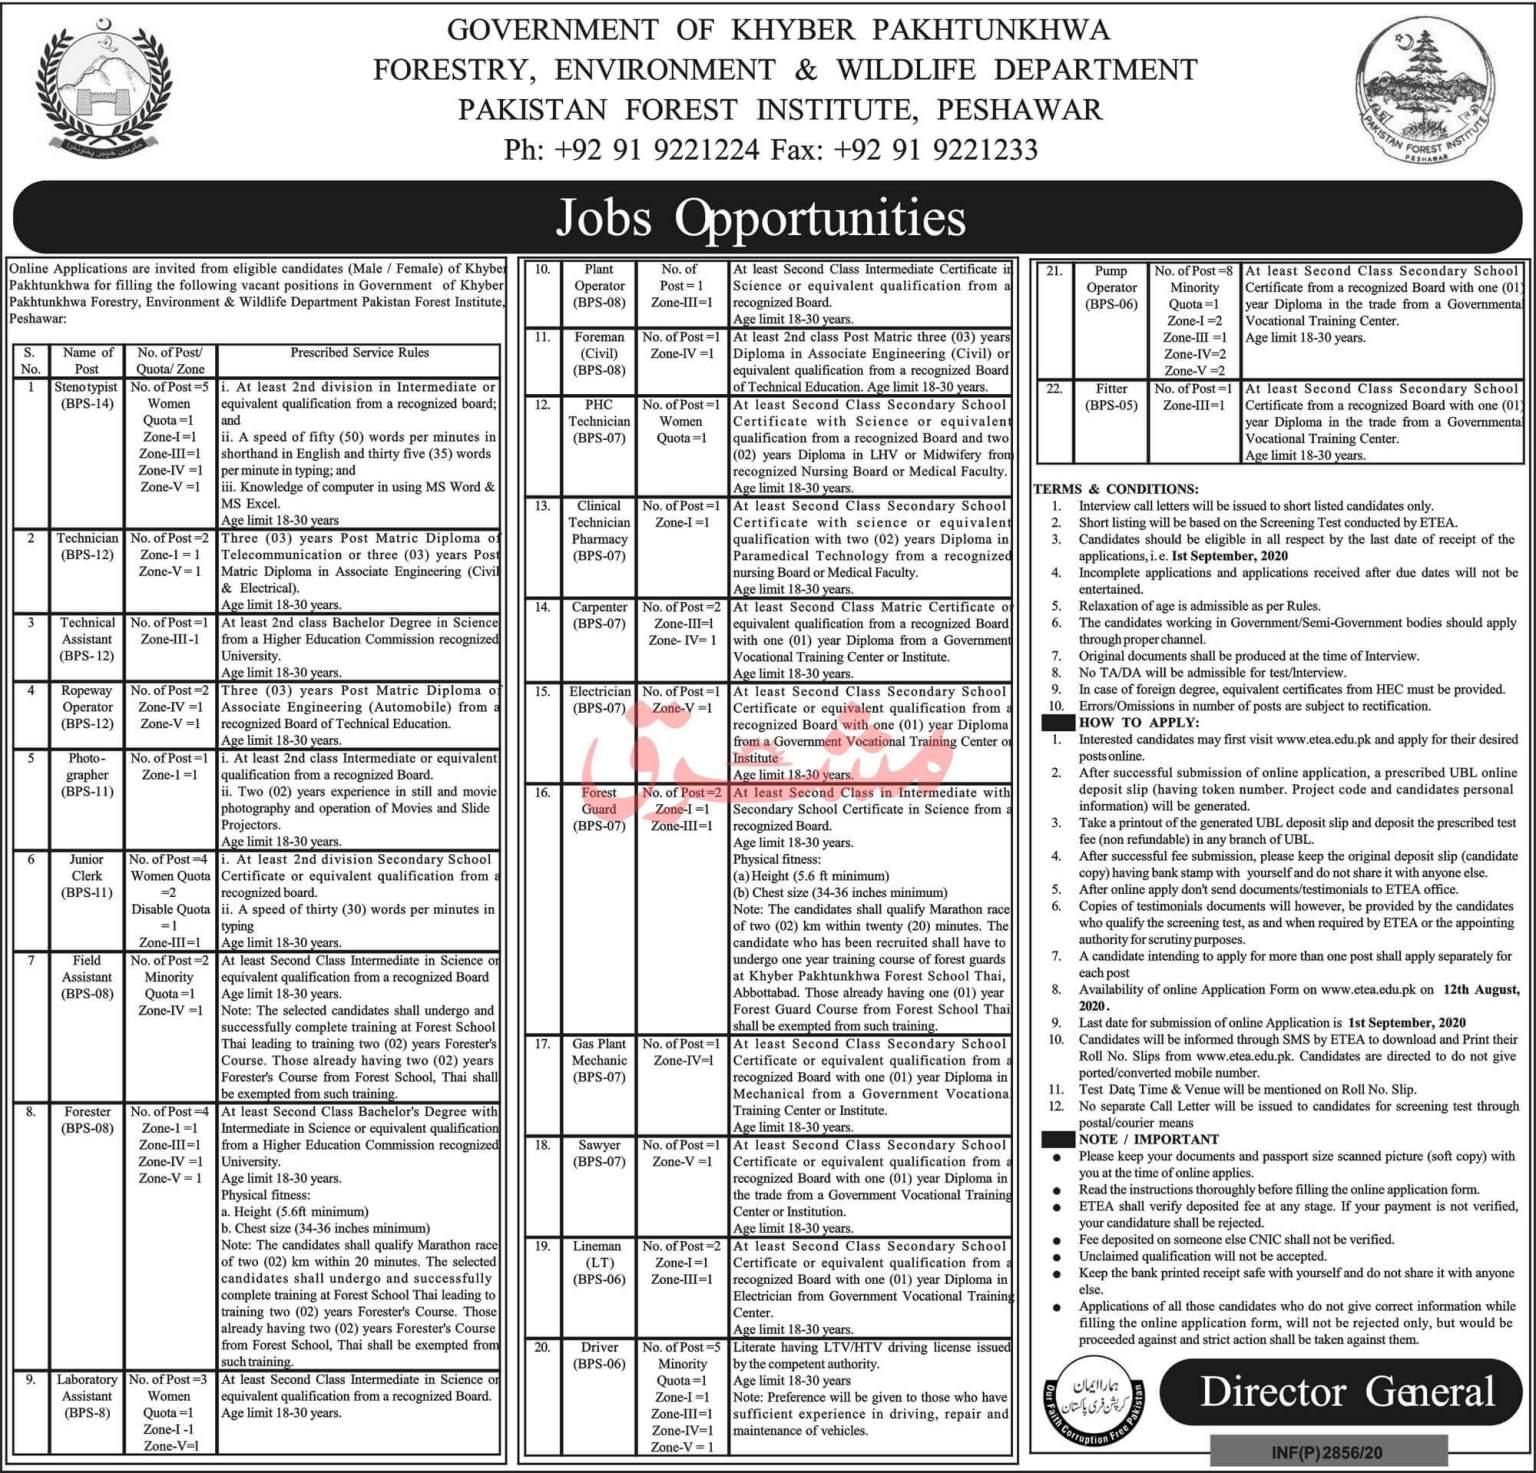 Pakistan Forest Institute Peshawar Jobs August 2020